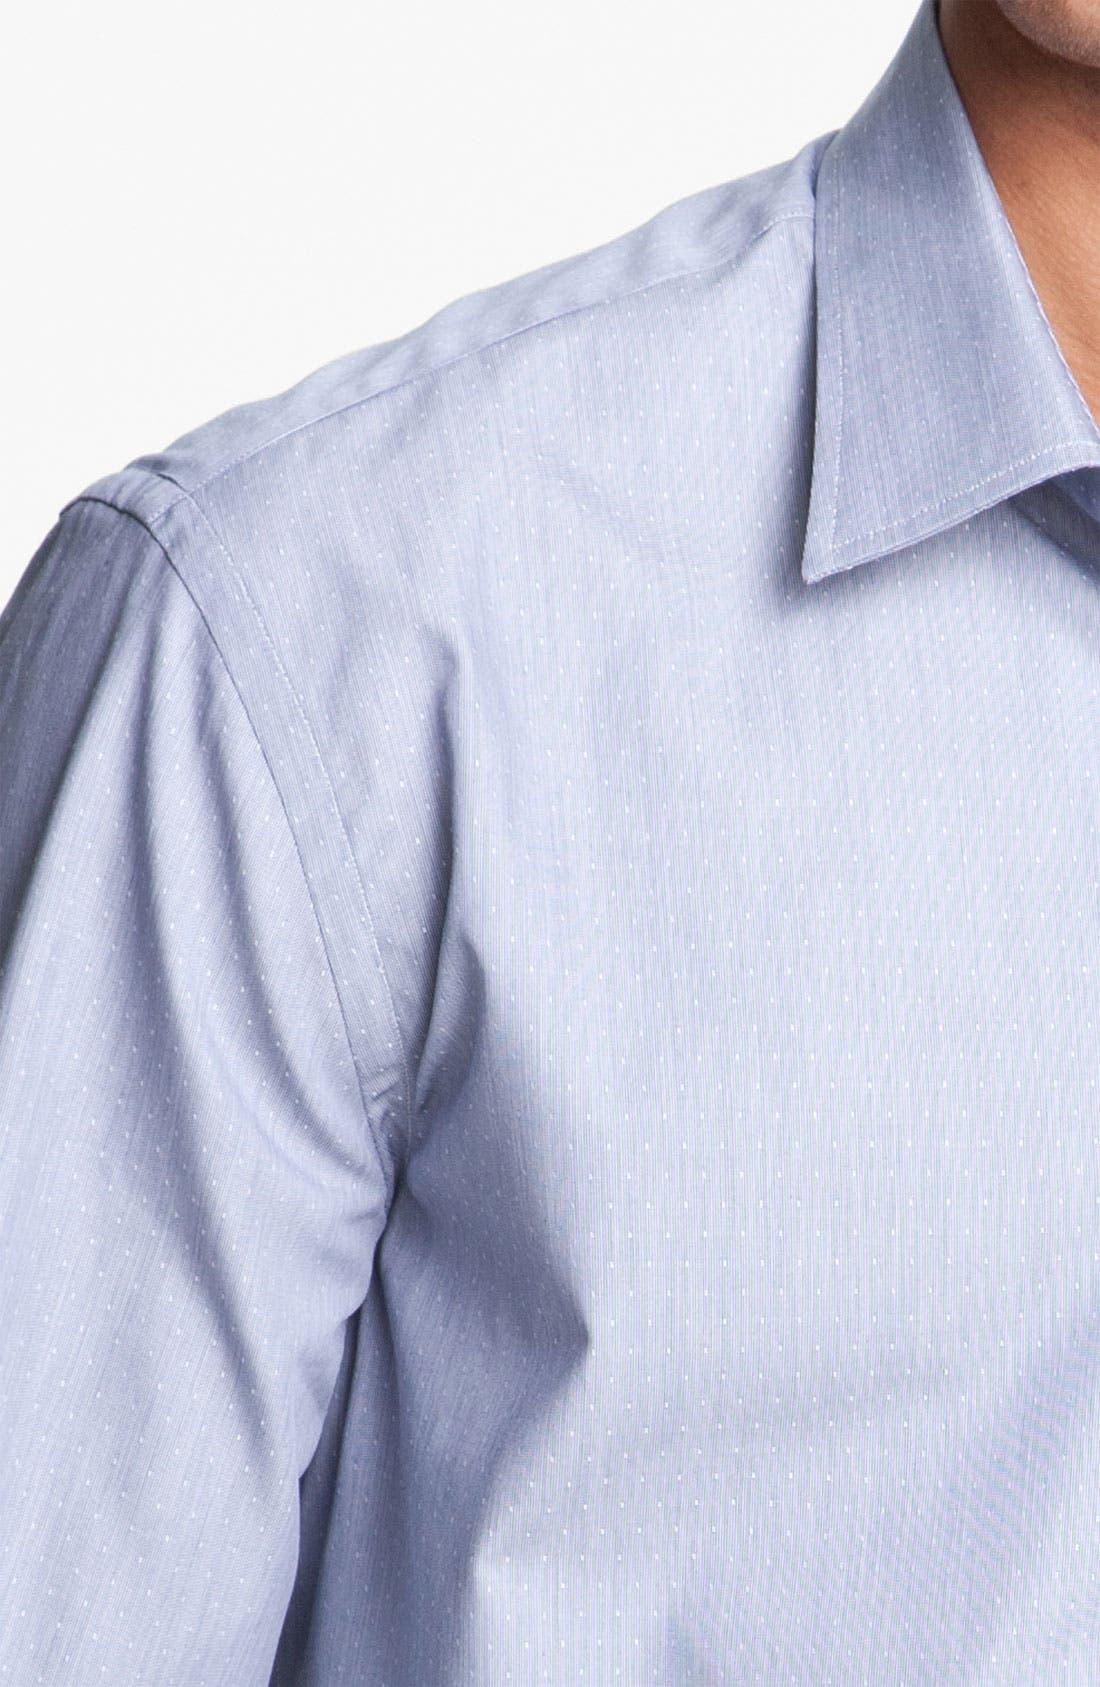 Alternate Image 3  - Paul Smith London Microdot Dress Shirt